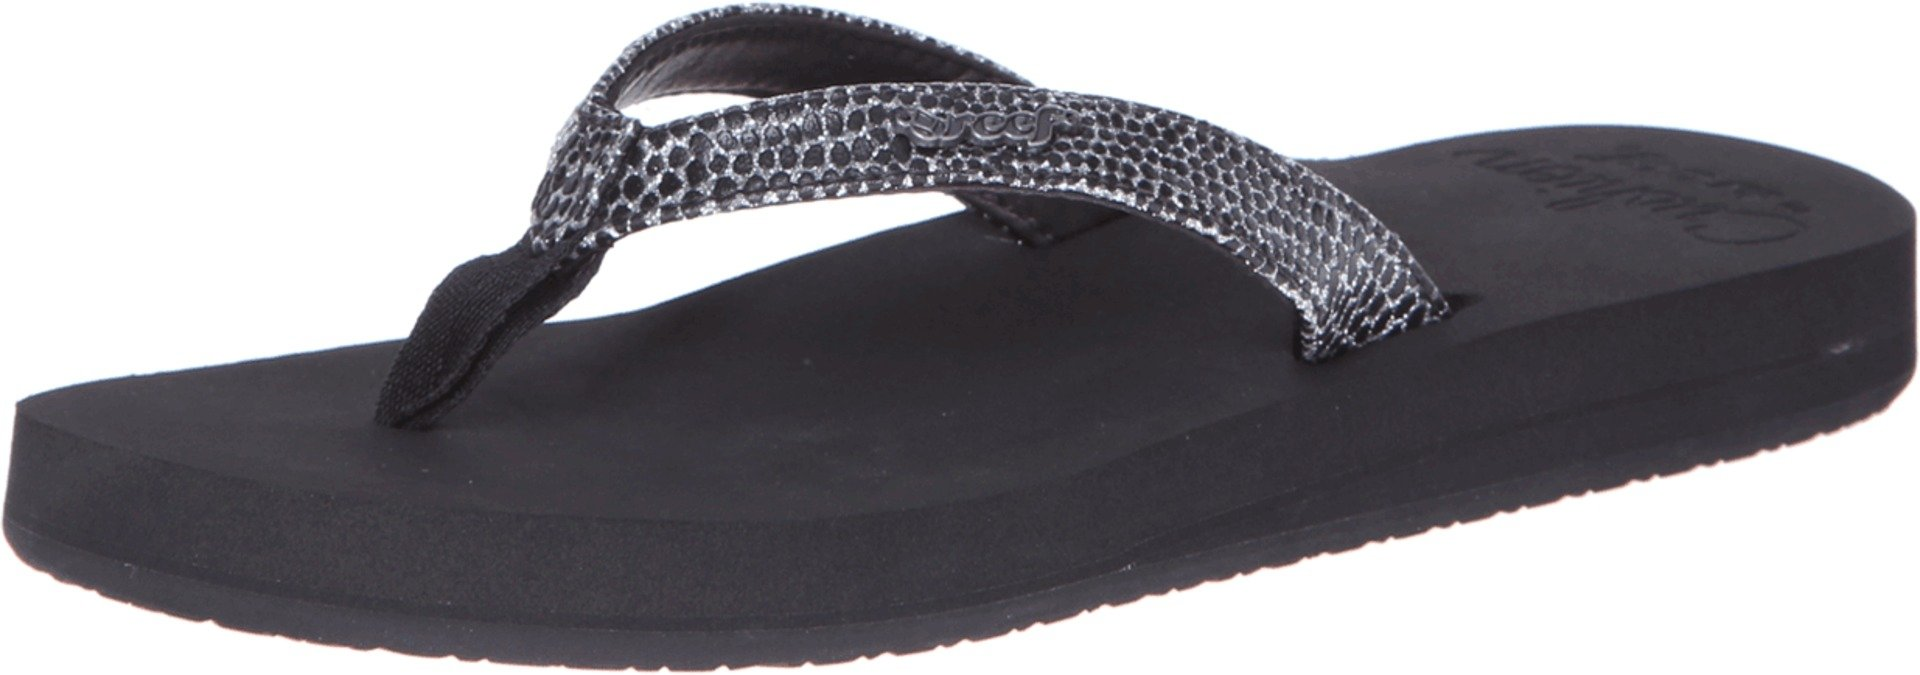 Reef Women's Star Cushion Sassy Sandal,Black/Silver,5 M US